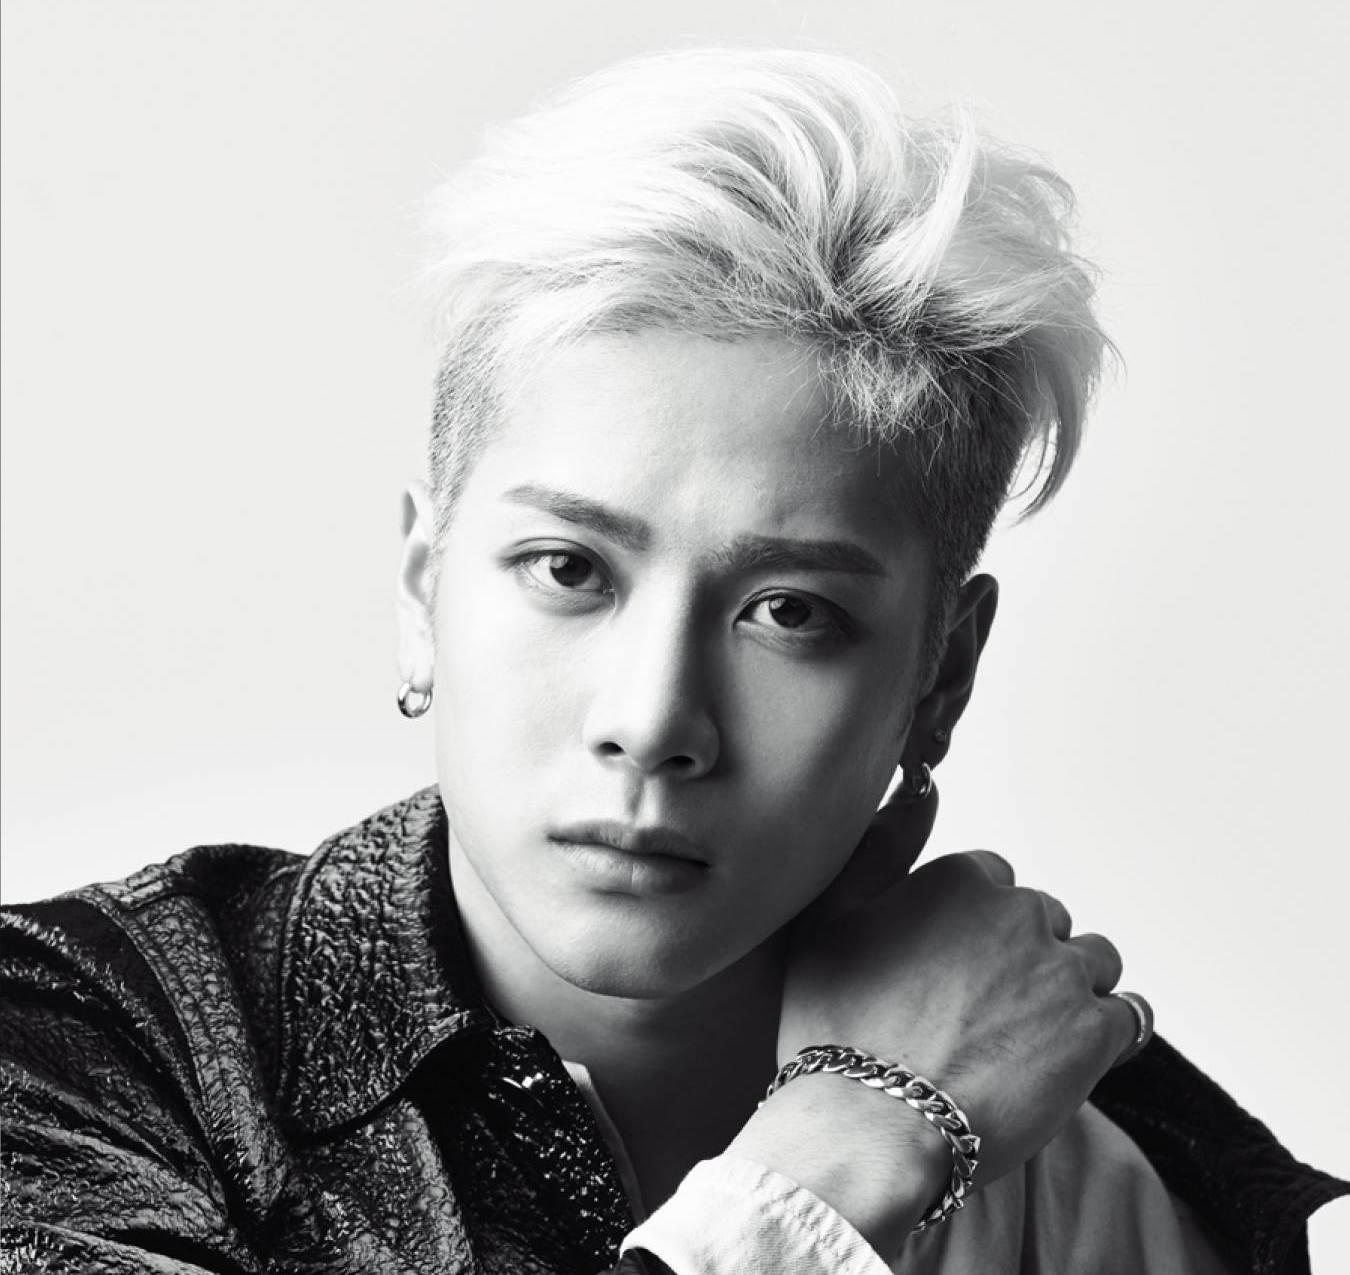 Jackson, Jackson Wang Profile, Jackson Profile, Jackson Wang Profile, GOT7, GOT7 Profile, GOT7 Jackson, GOT7 Jackson Profile